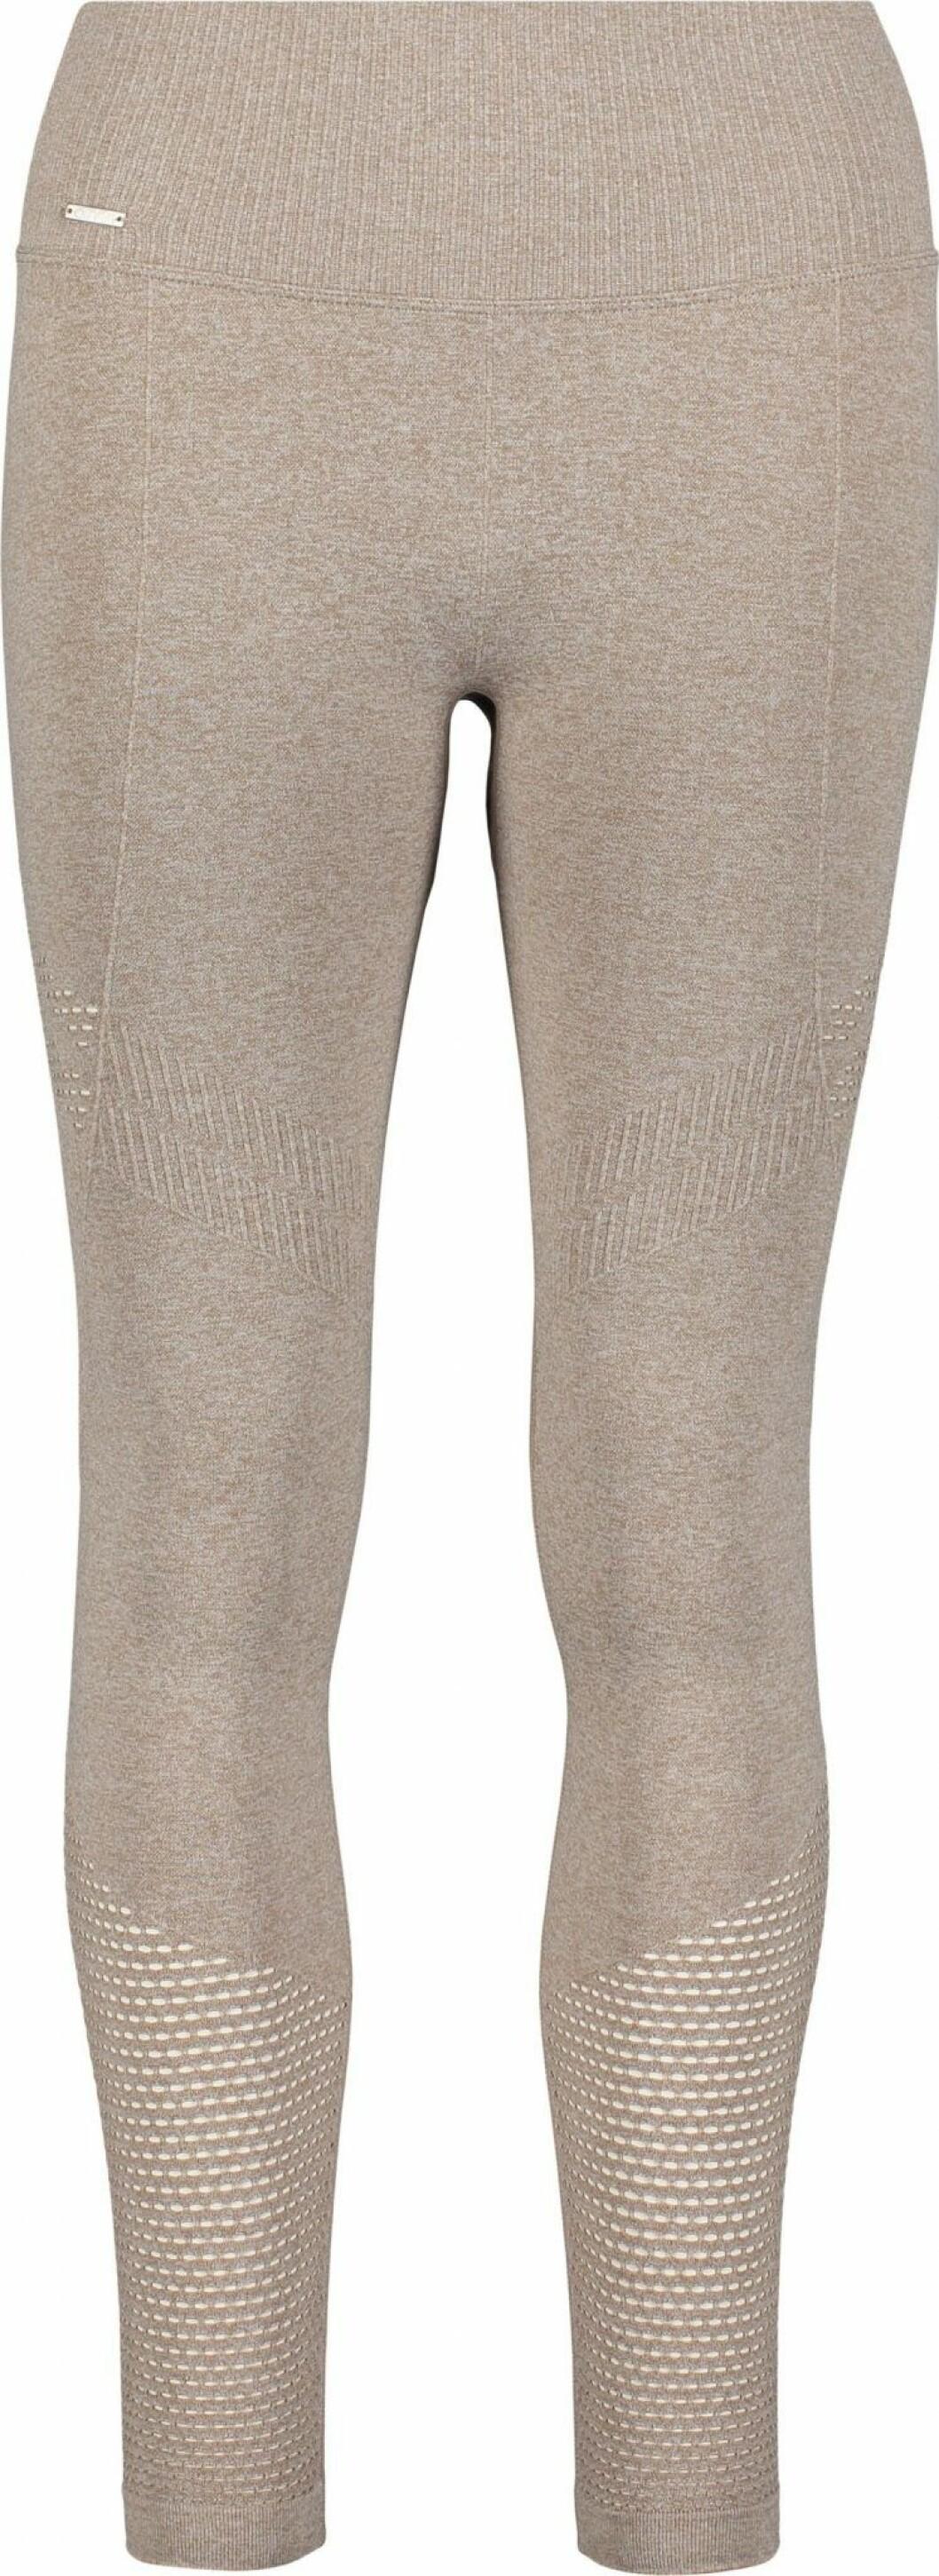 Leggings i beige från Aim'n.